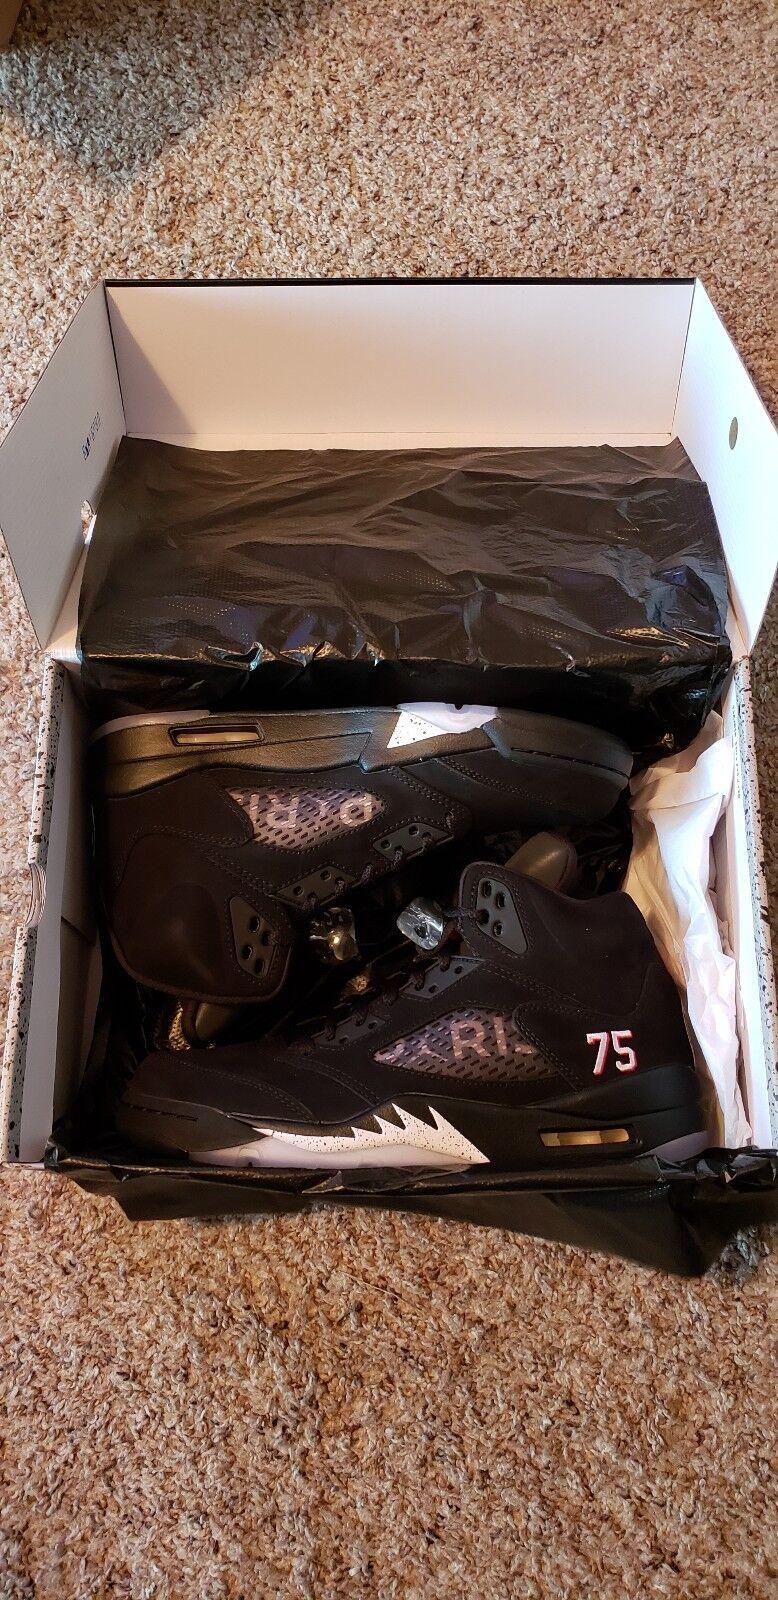 Jordan 5 Retro Negro (Air Paris St-Germain) (sin usar)